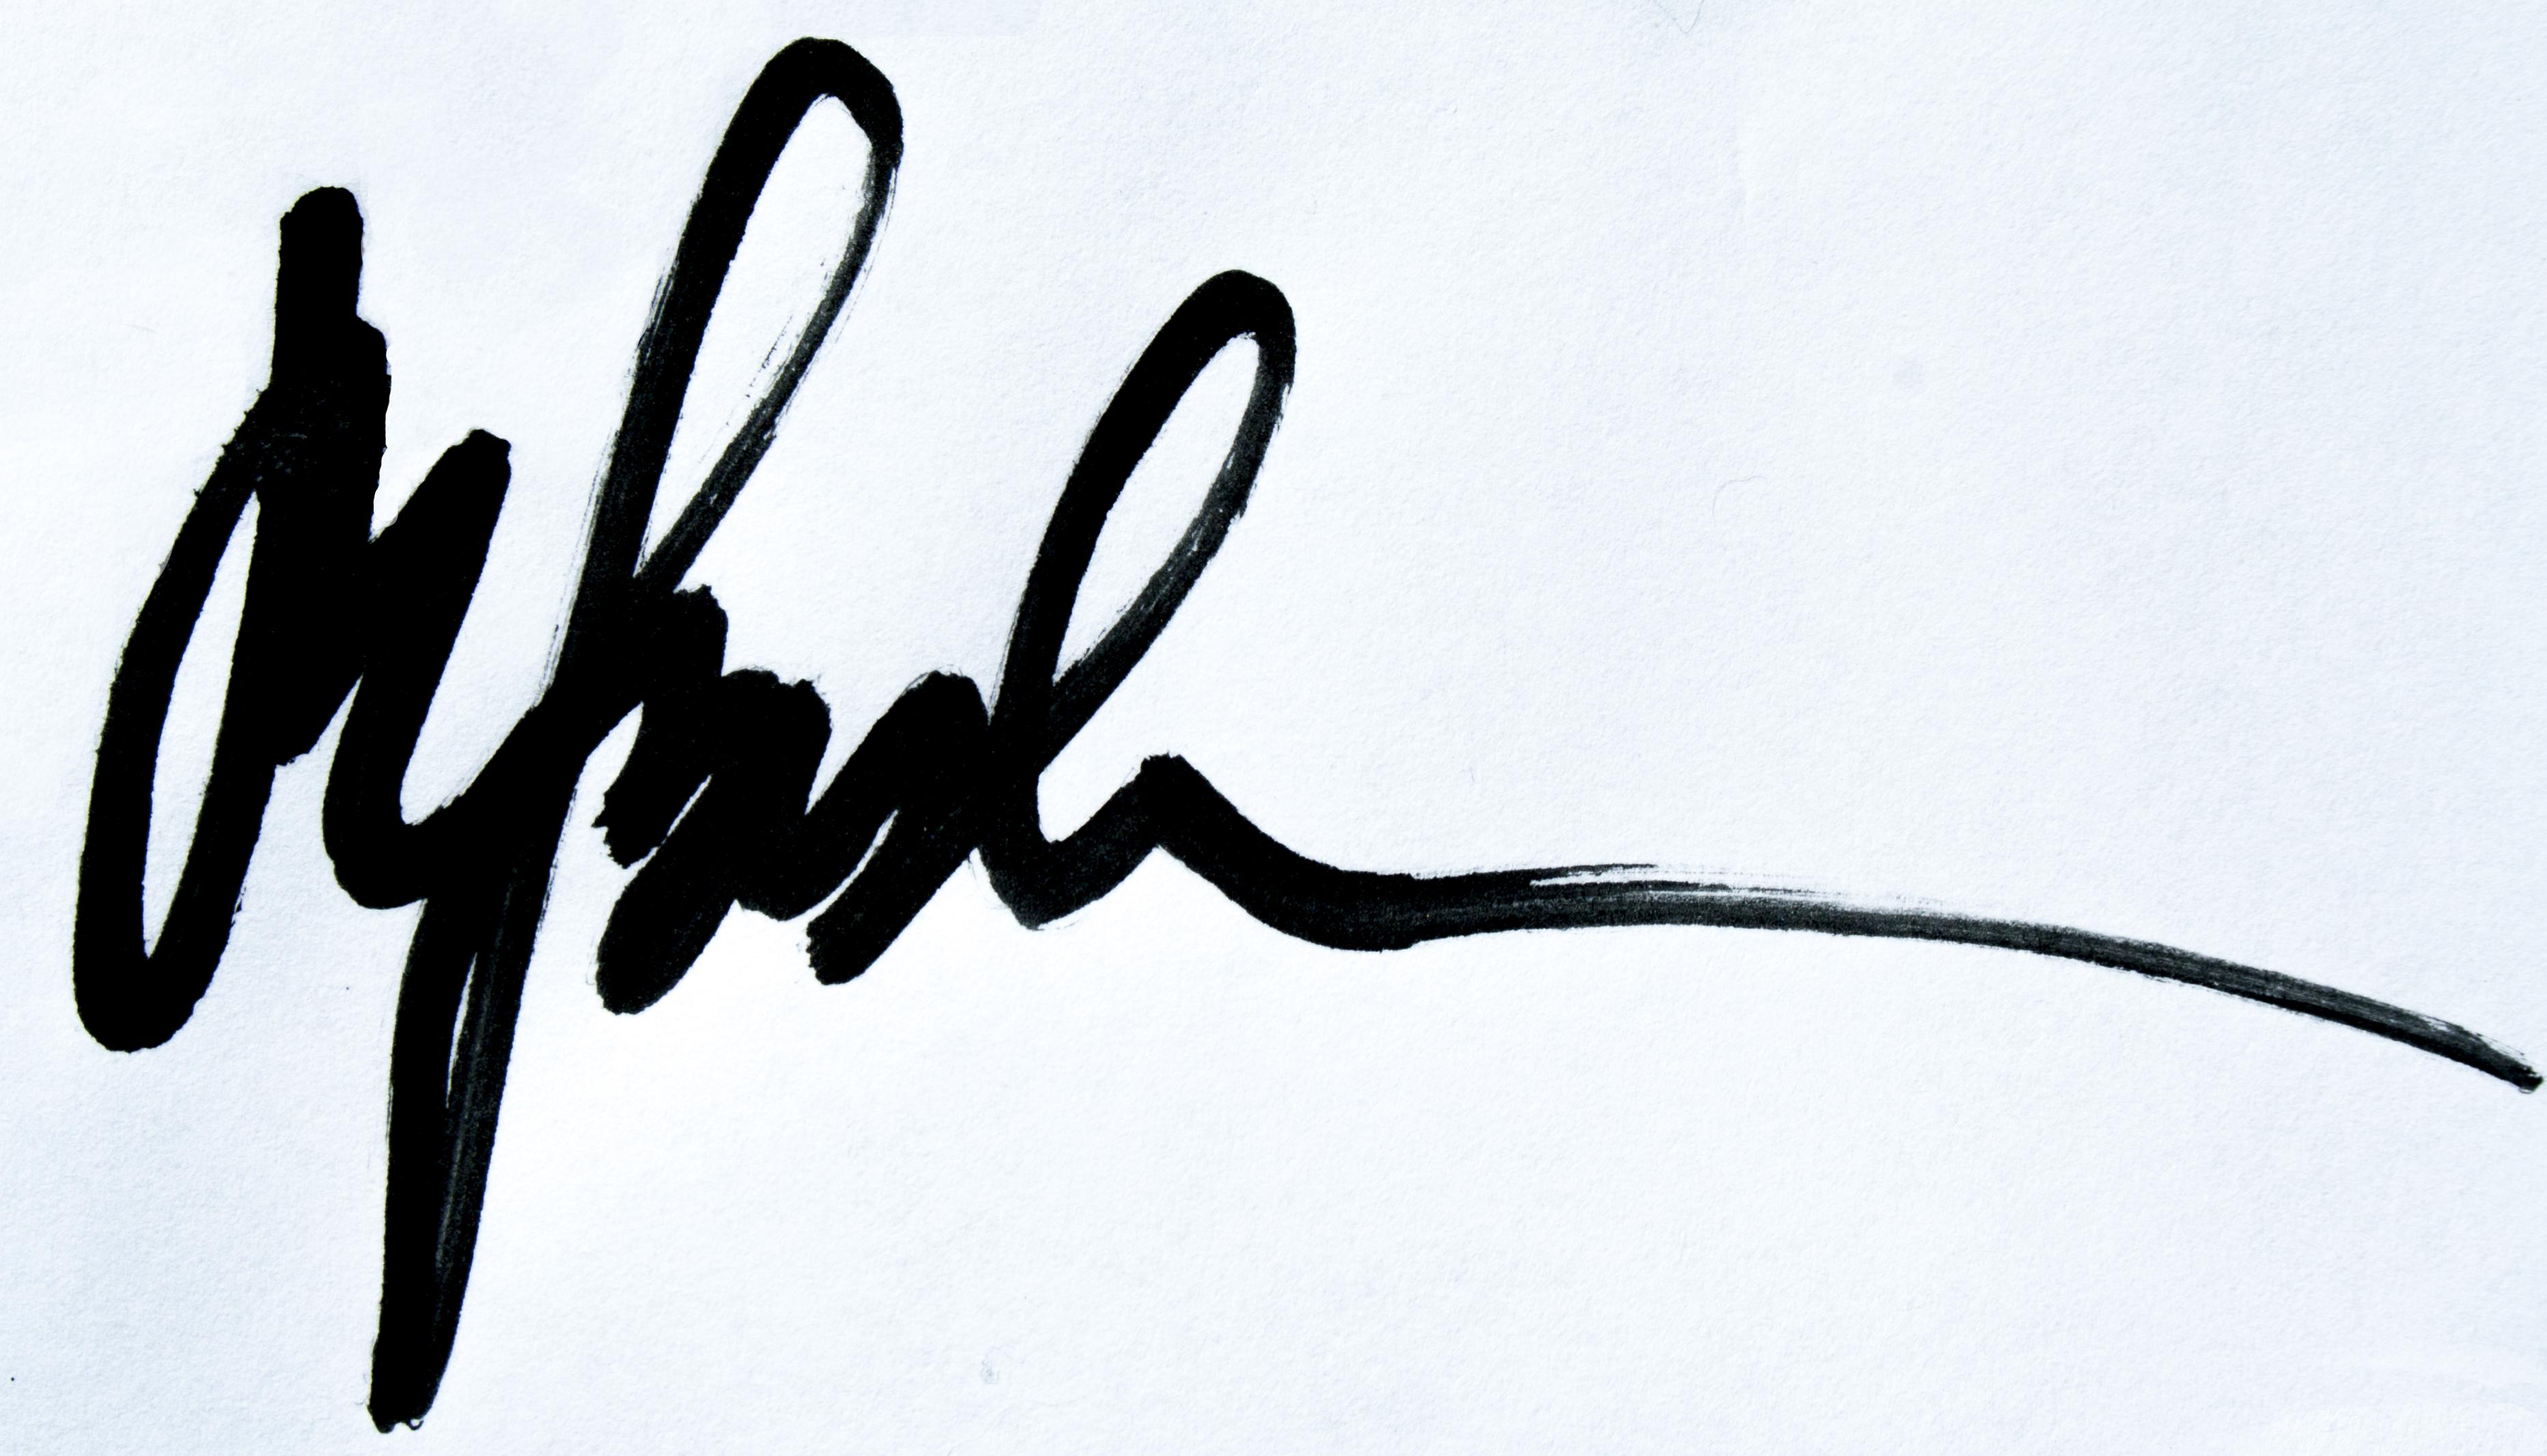 magdalena borkowska's Signature